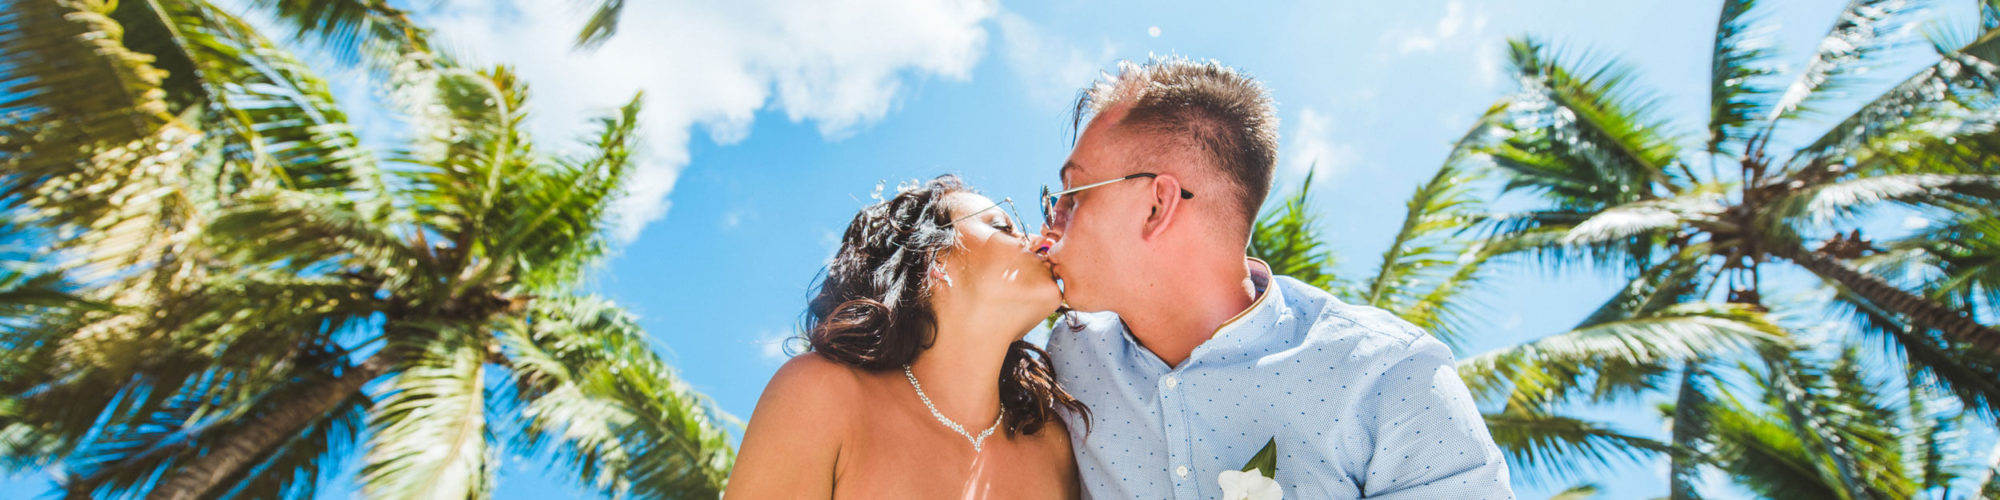 Ślub na Dominikanie